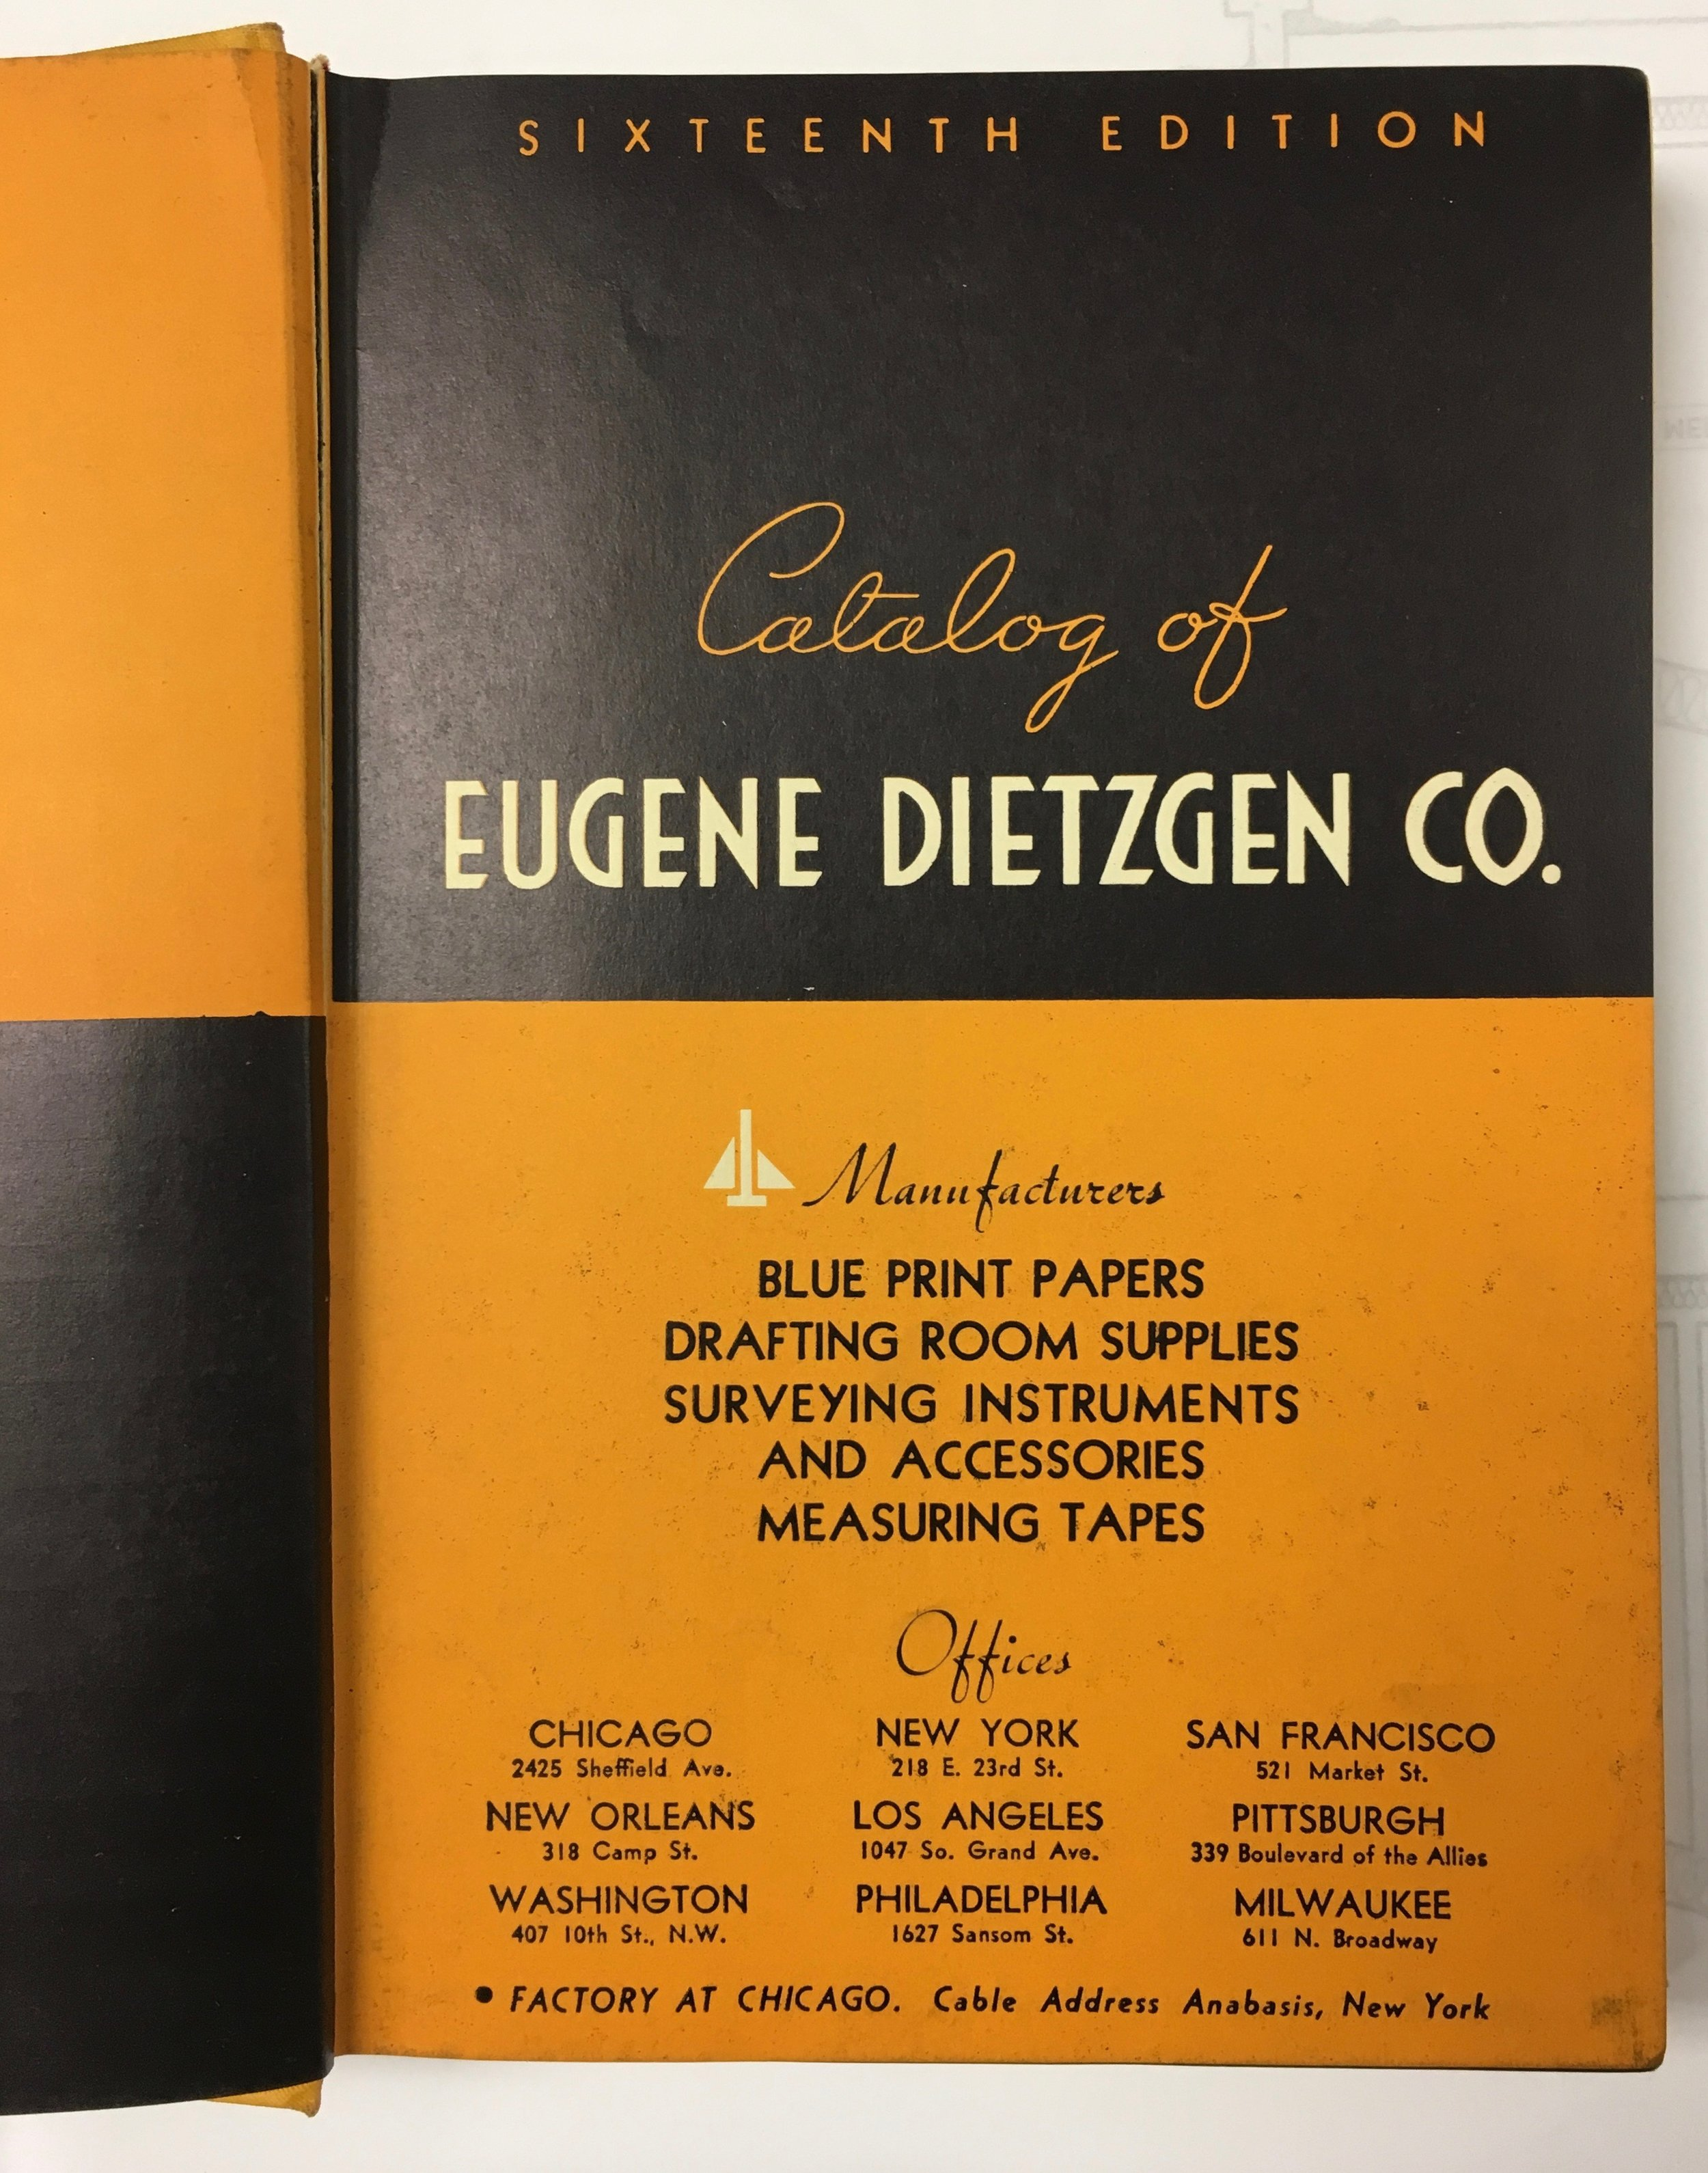 Dietzgen Catalog 16 frontis.jpg